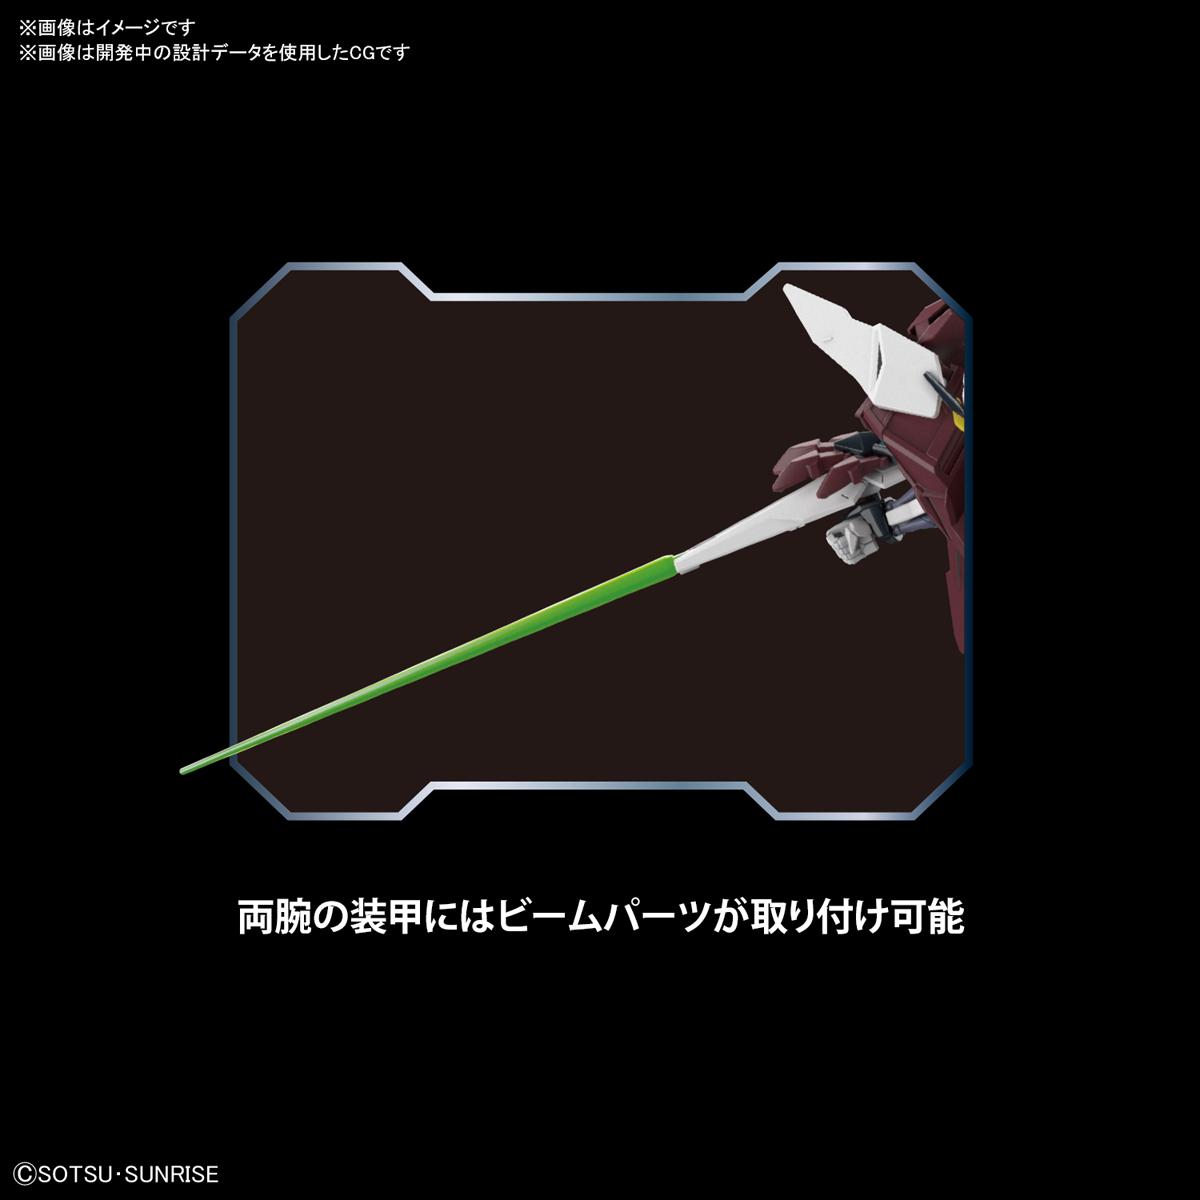 HGBD:R 1/144『ガンダムアストレイ系新機体』ガンダムビルドダイバーズRe:RISE プラモデル-005